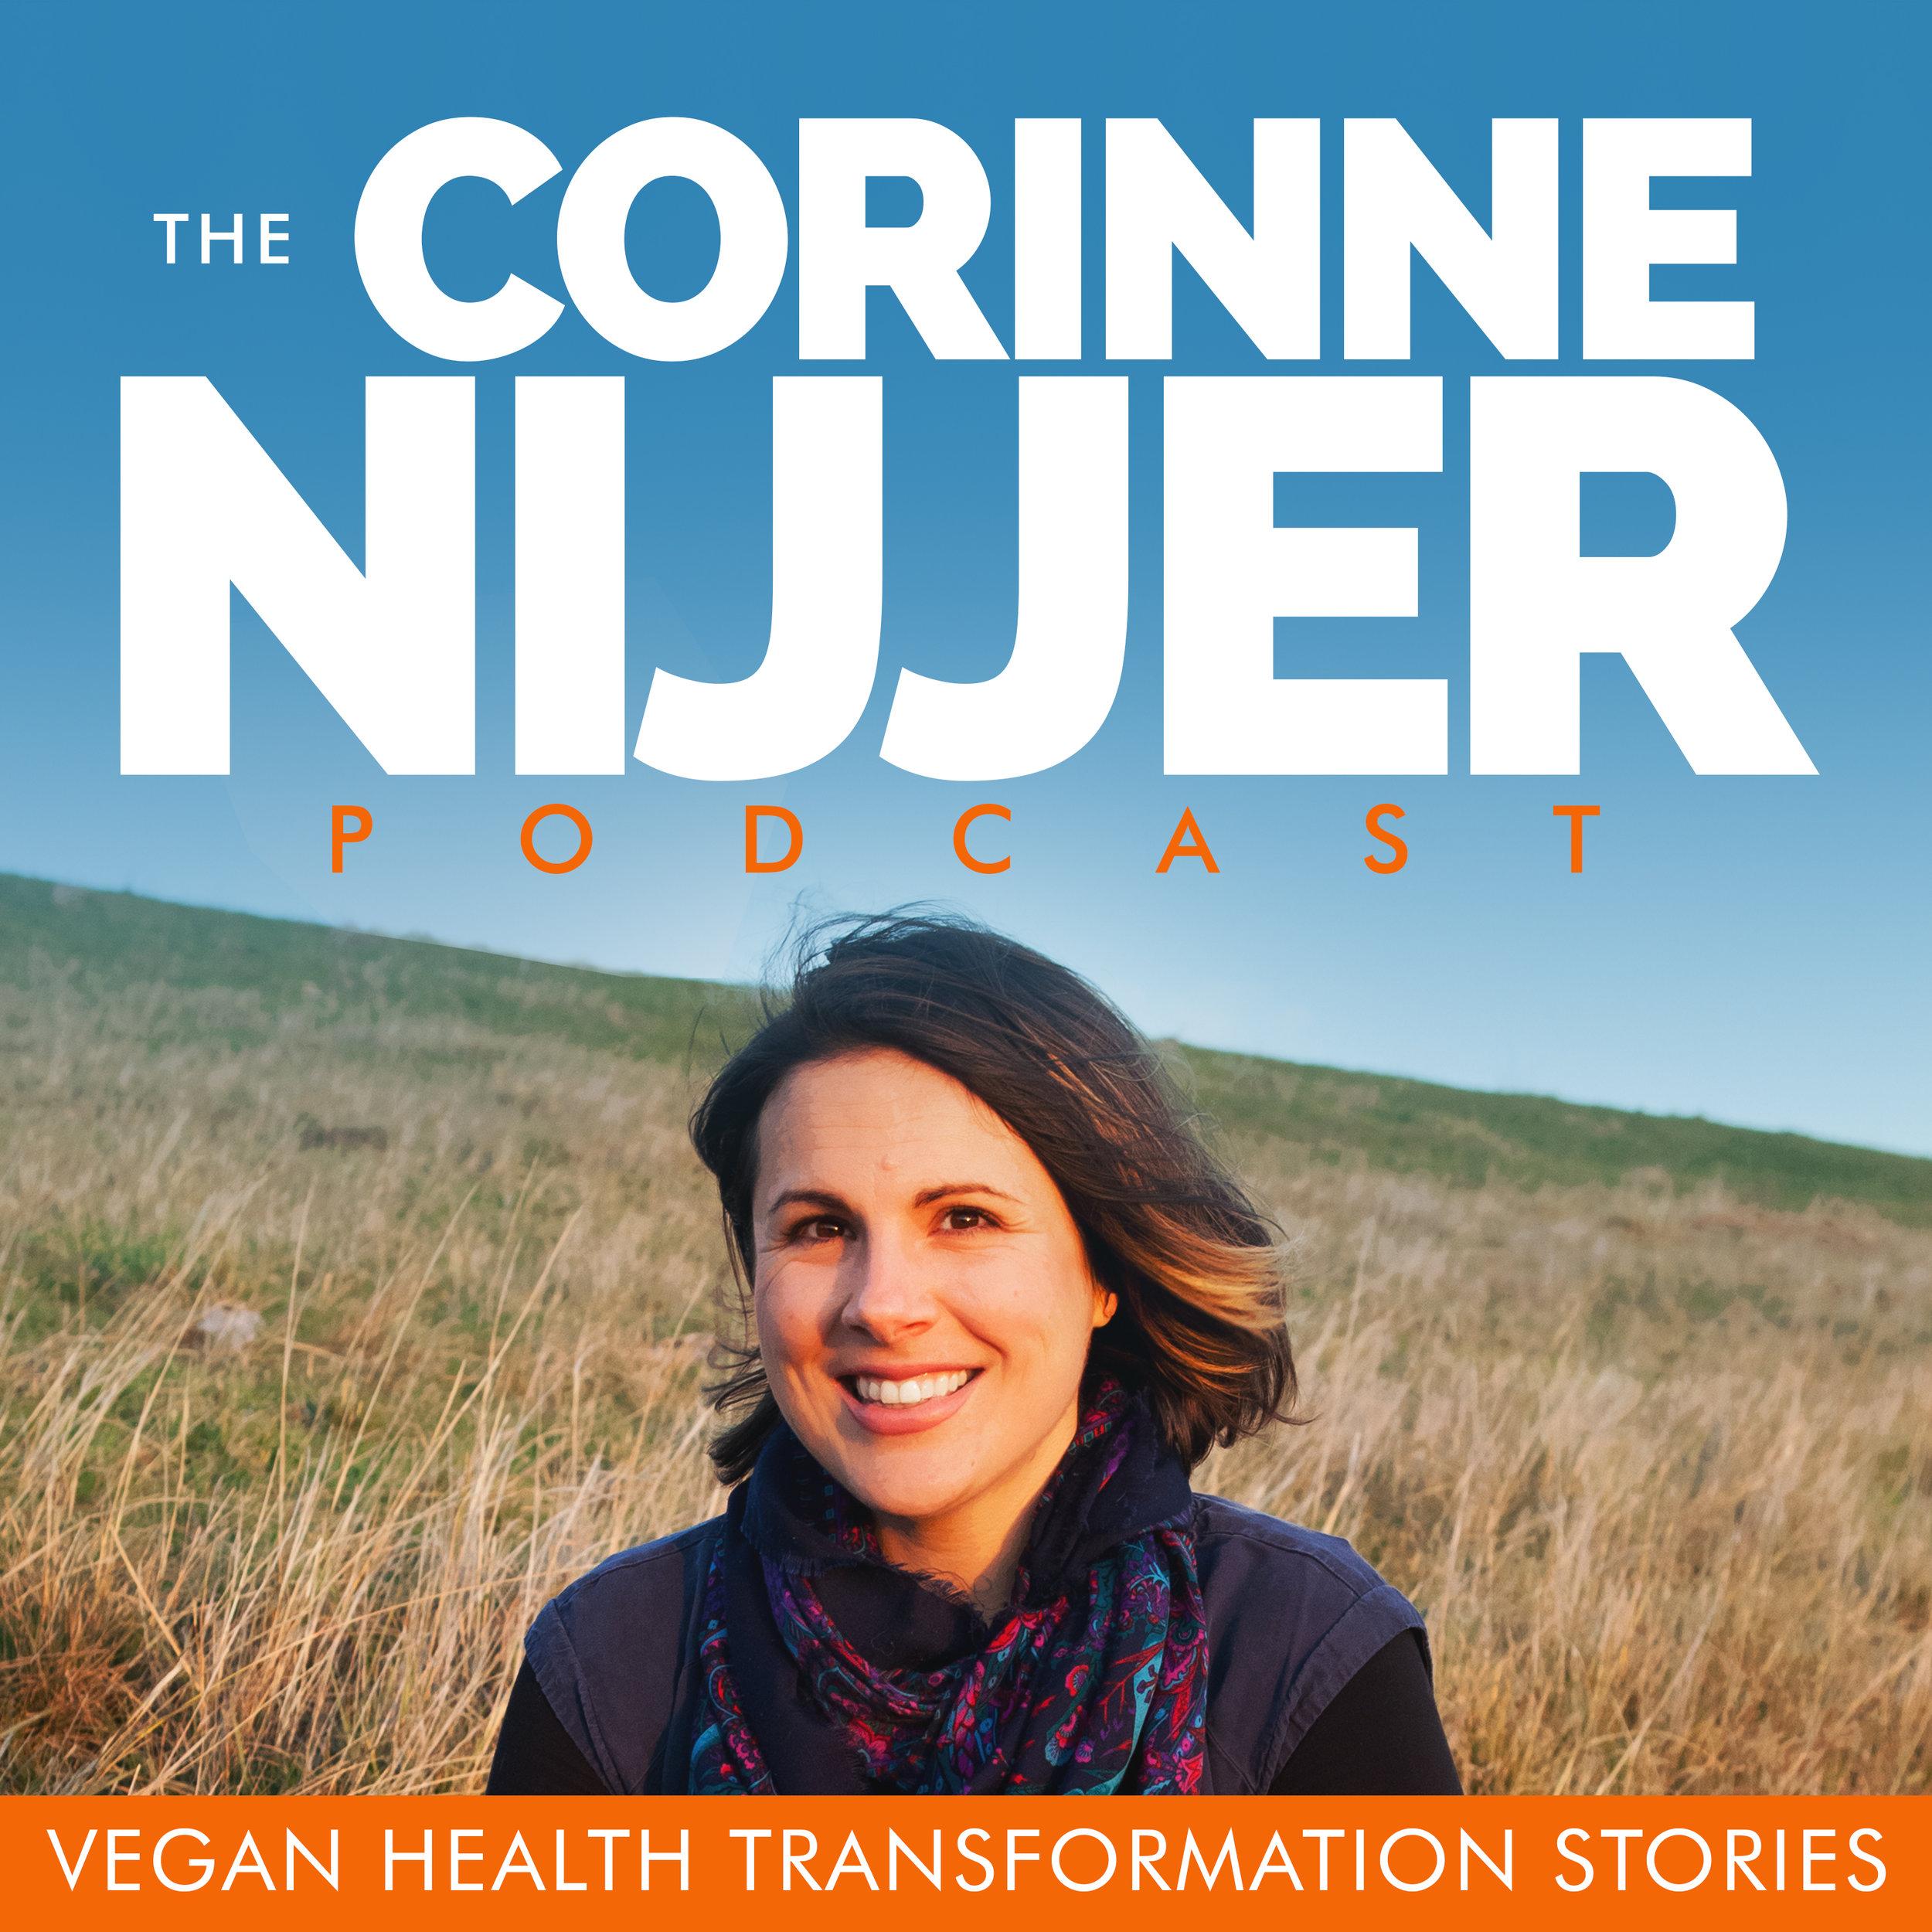 Corinne podcast.jpg